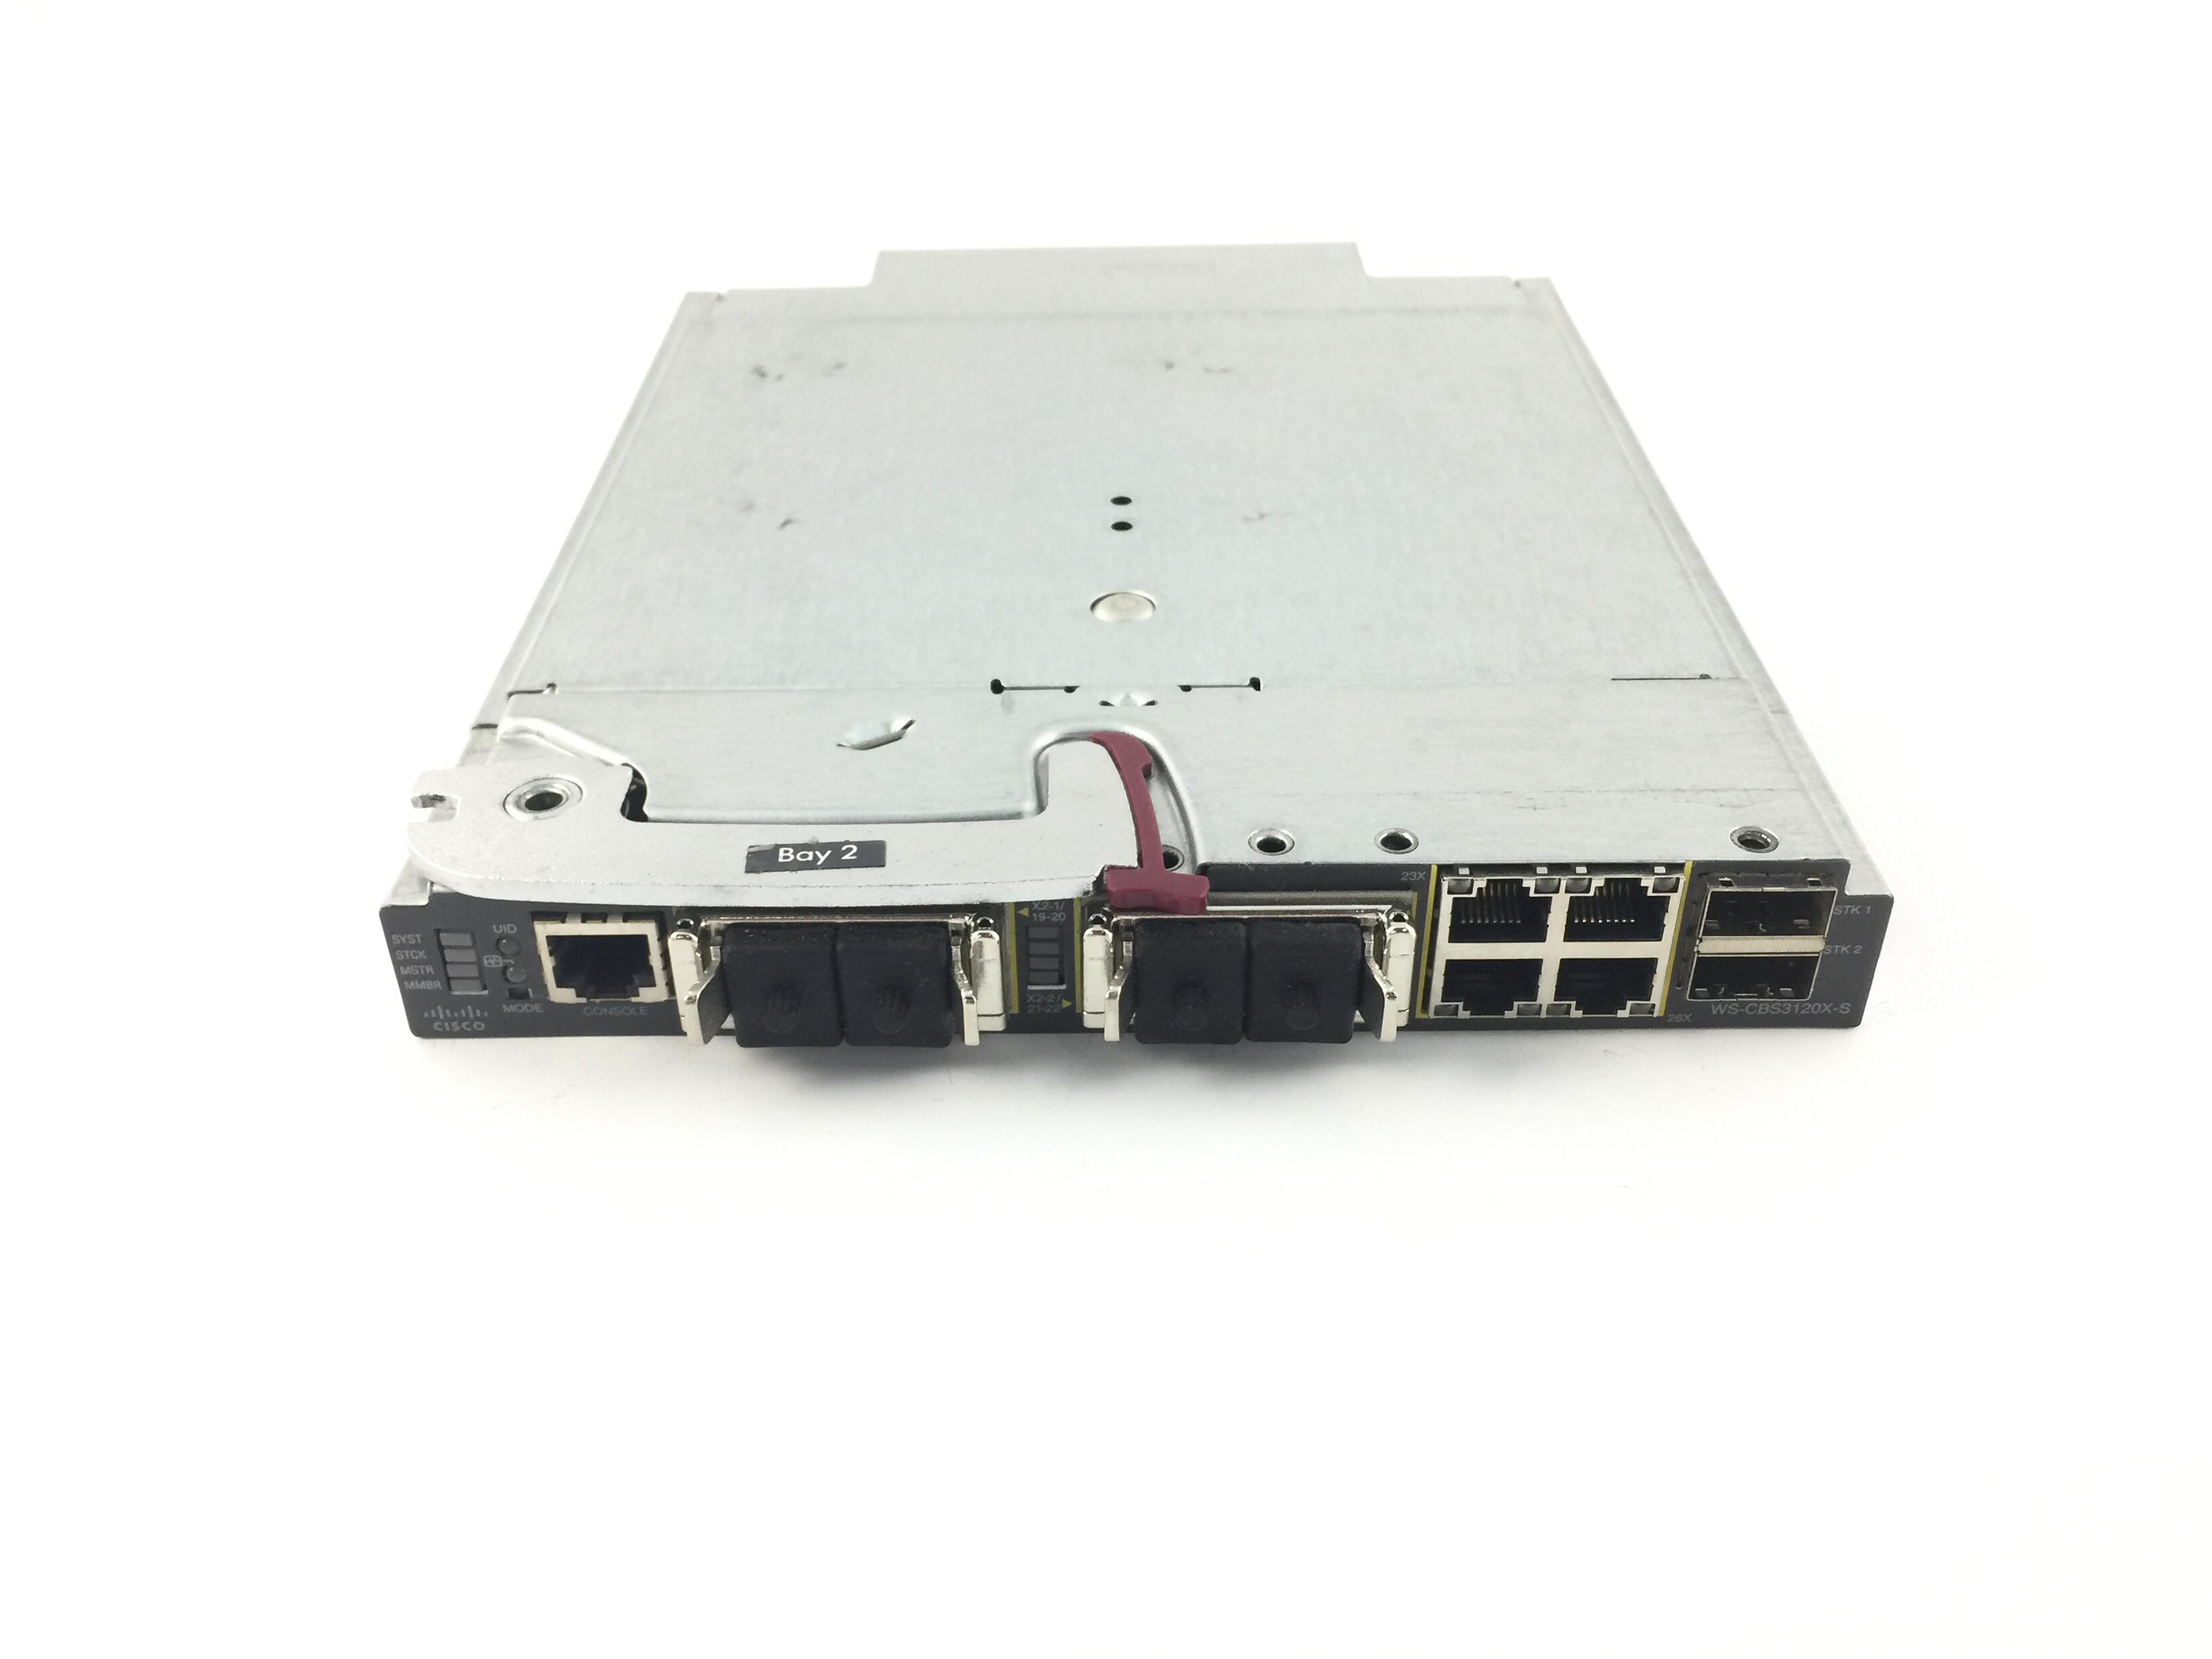 HP BLC7000 Cisco 3120X Catalyst Blade Switch (451357-001)